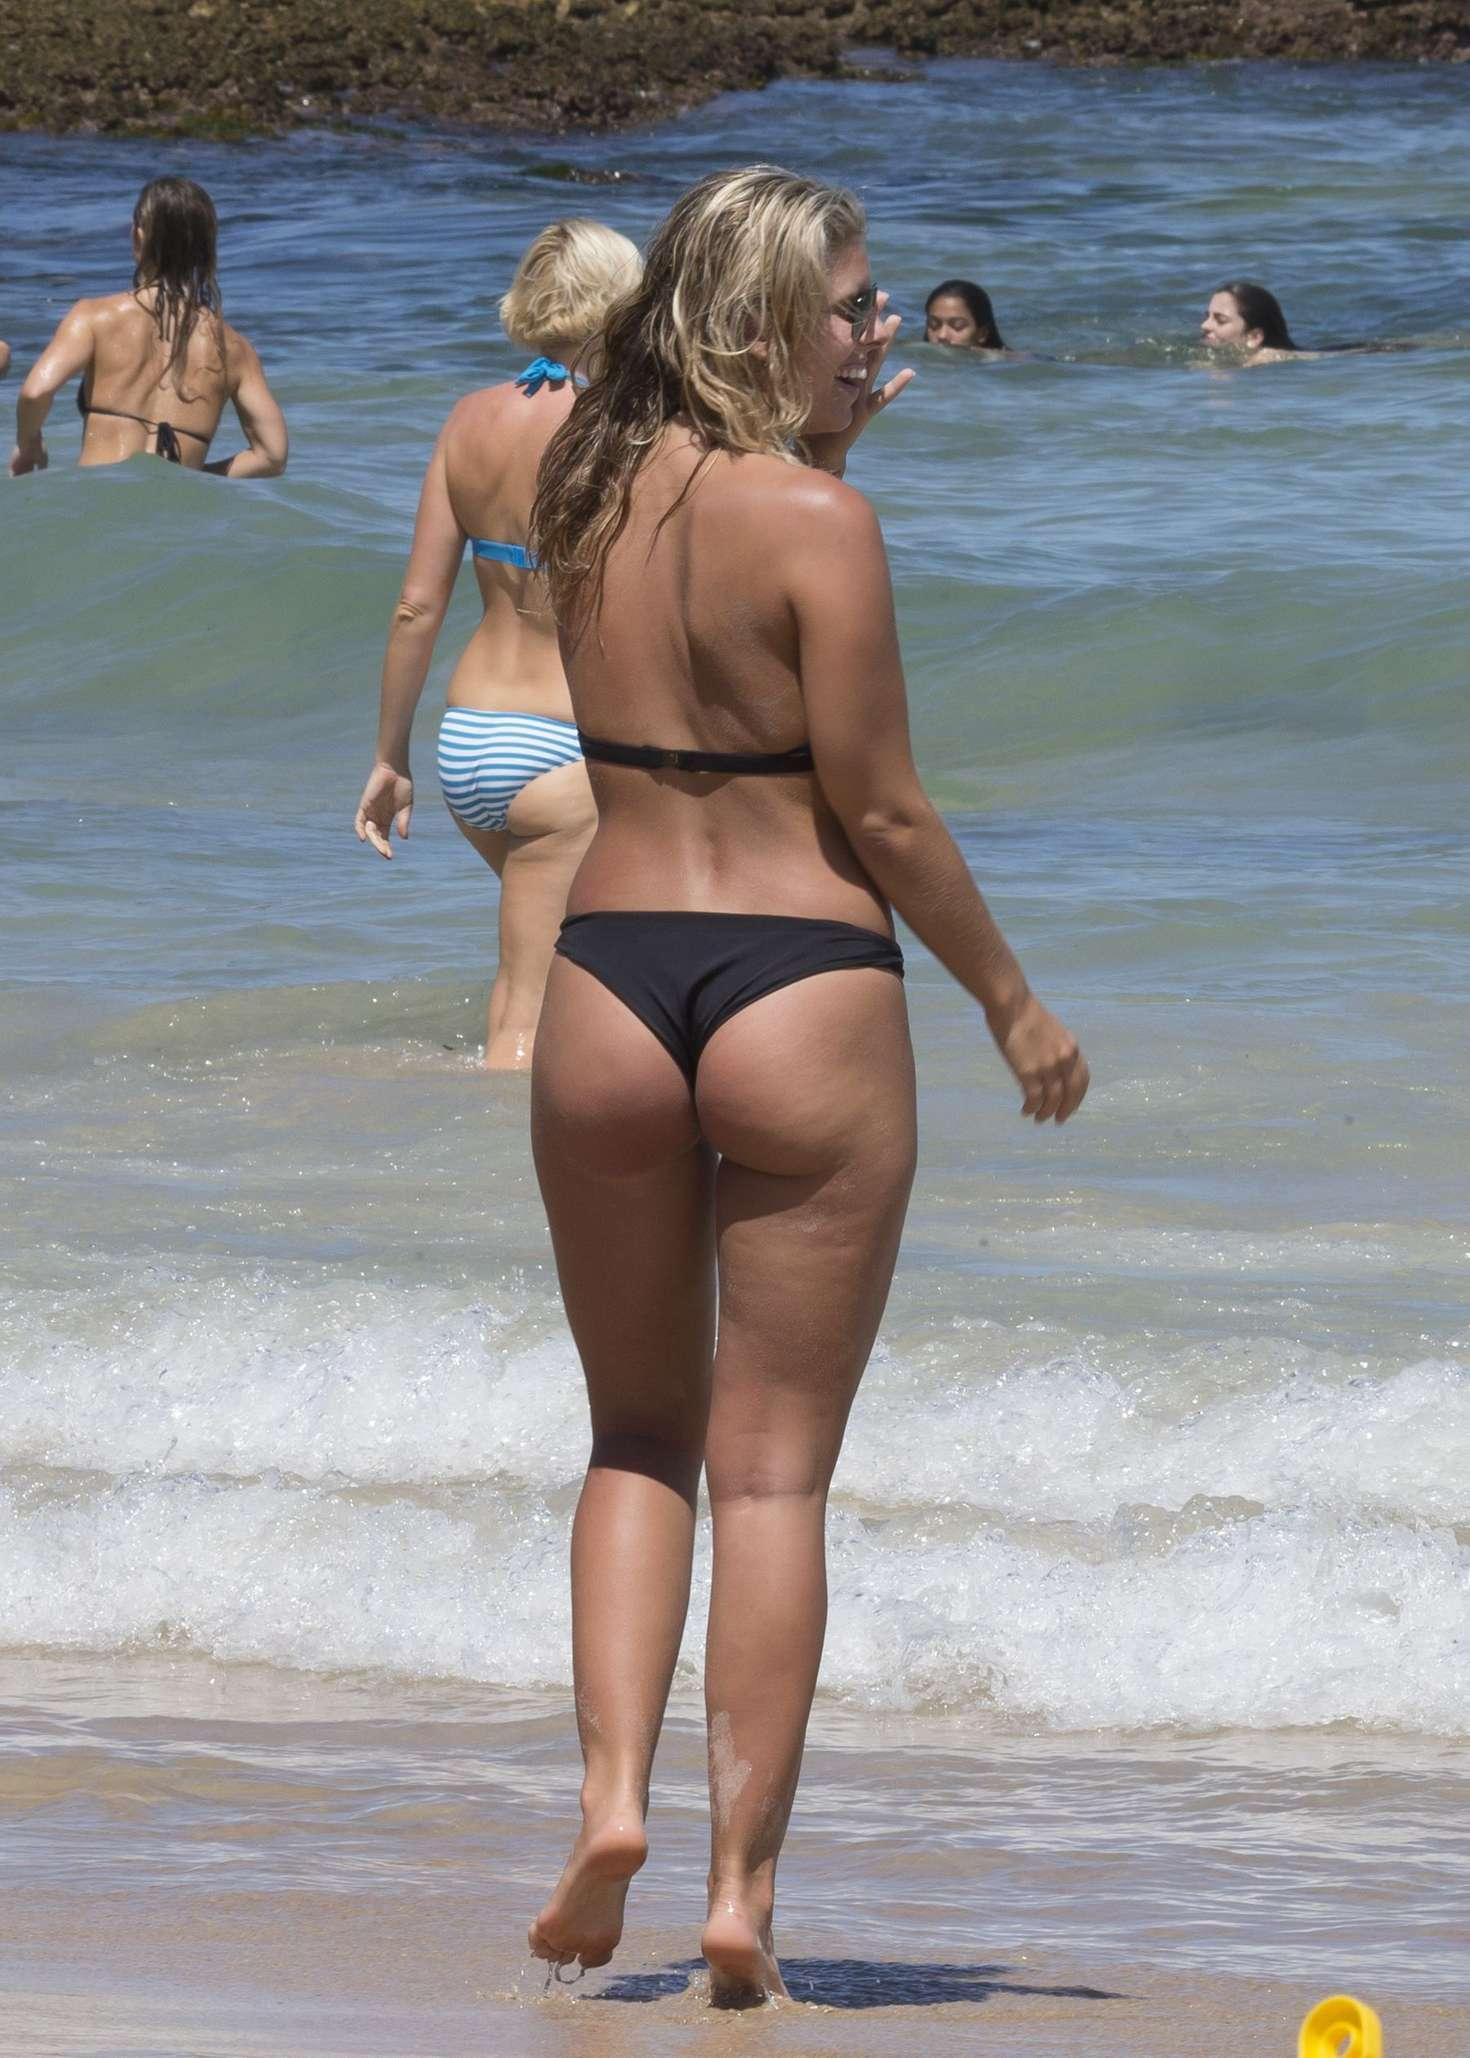 Hailey clauson hot,Kendal schuler tits Hot pics & movies Christina Hendricks Sexy -,Alexandra chando nude lying game star looks like nina dobrev